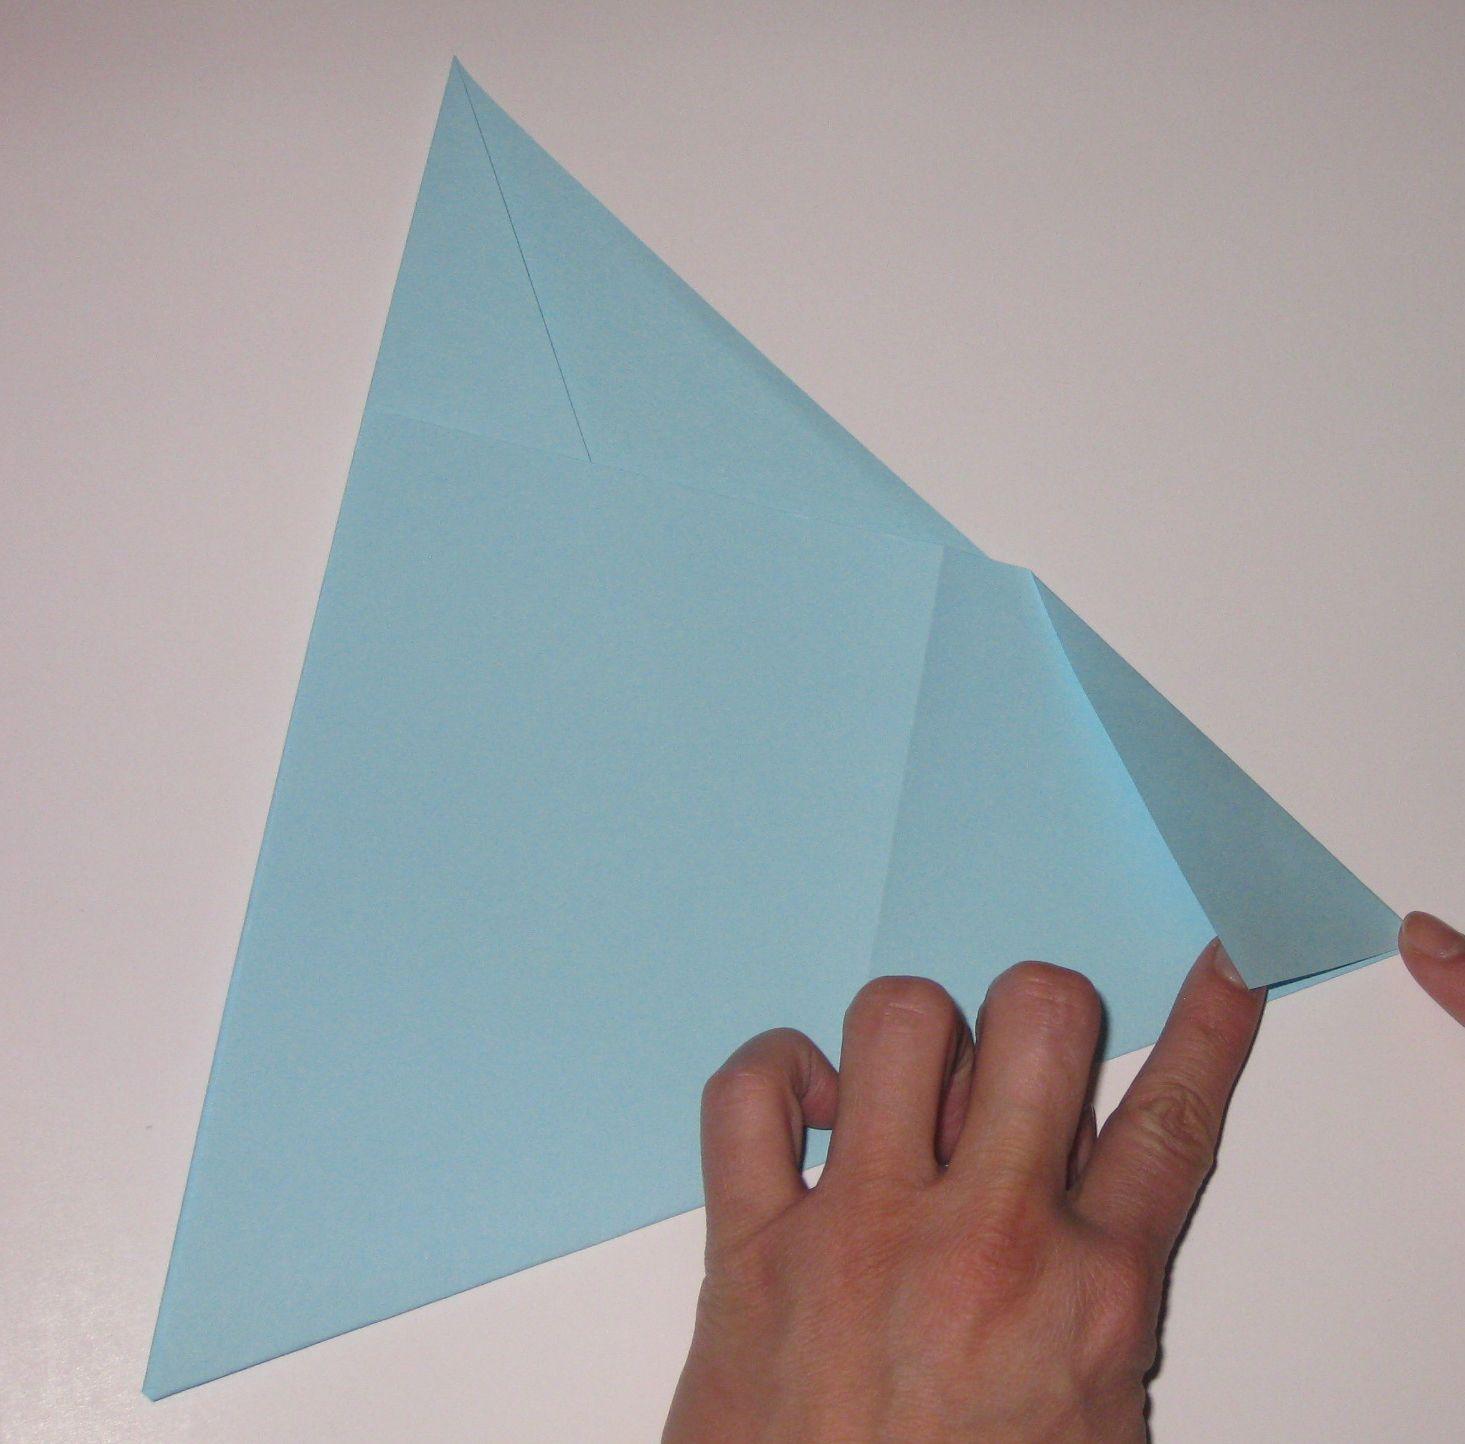 Geometrische Objekte falten | Geometrieunterricht